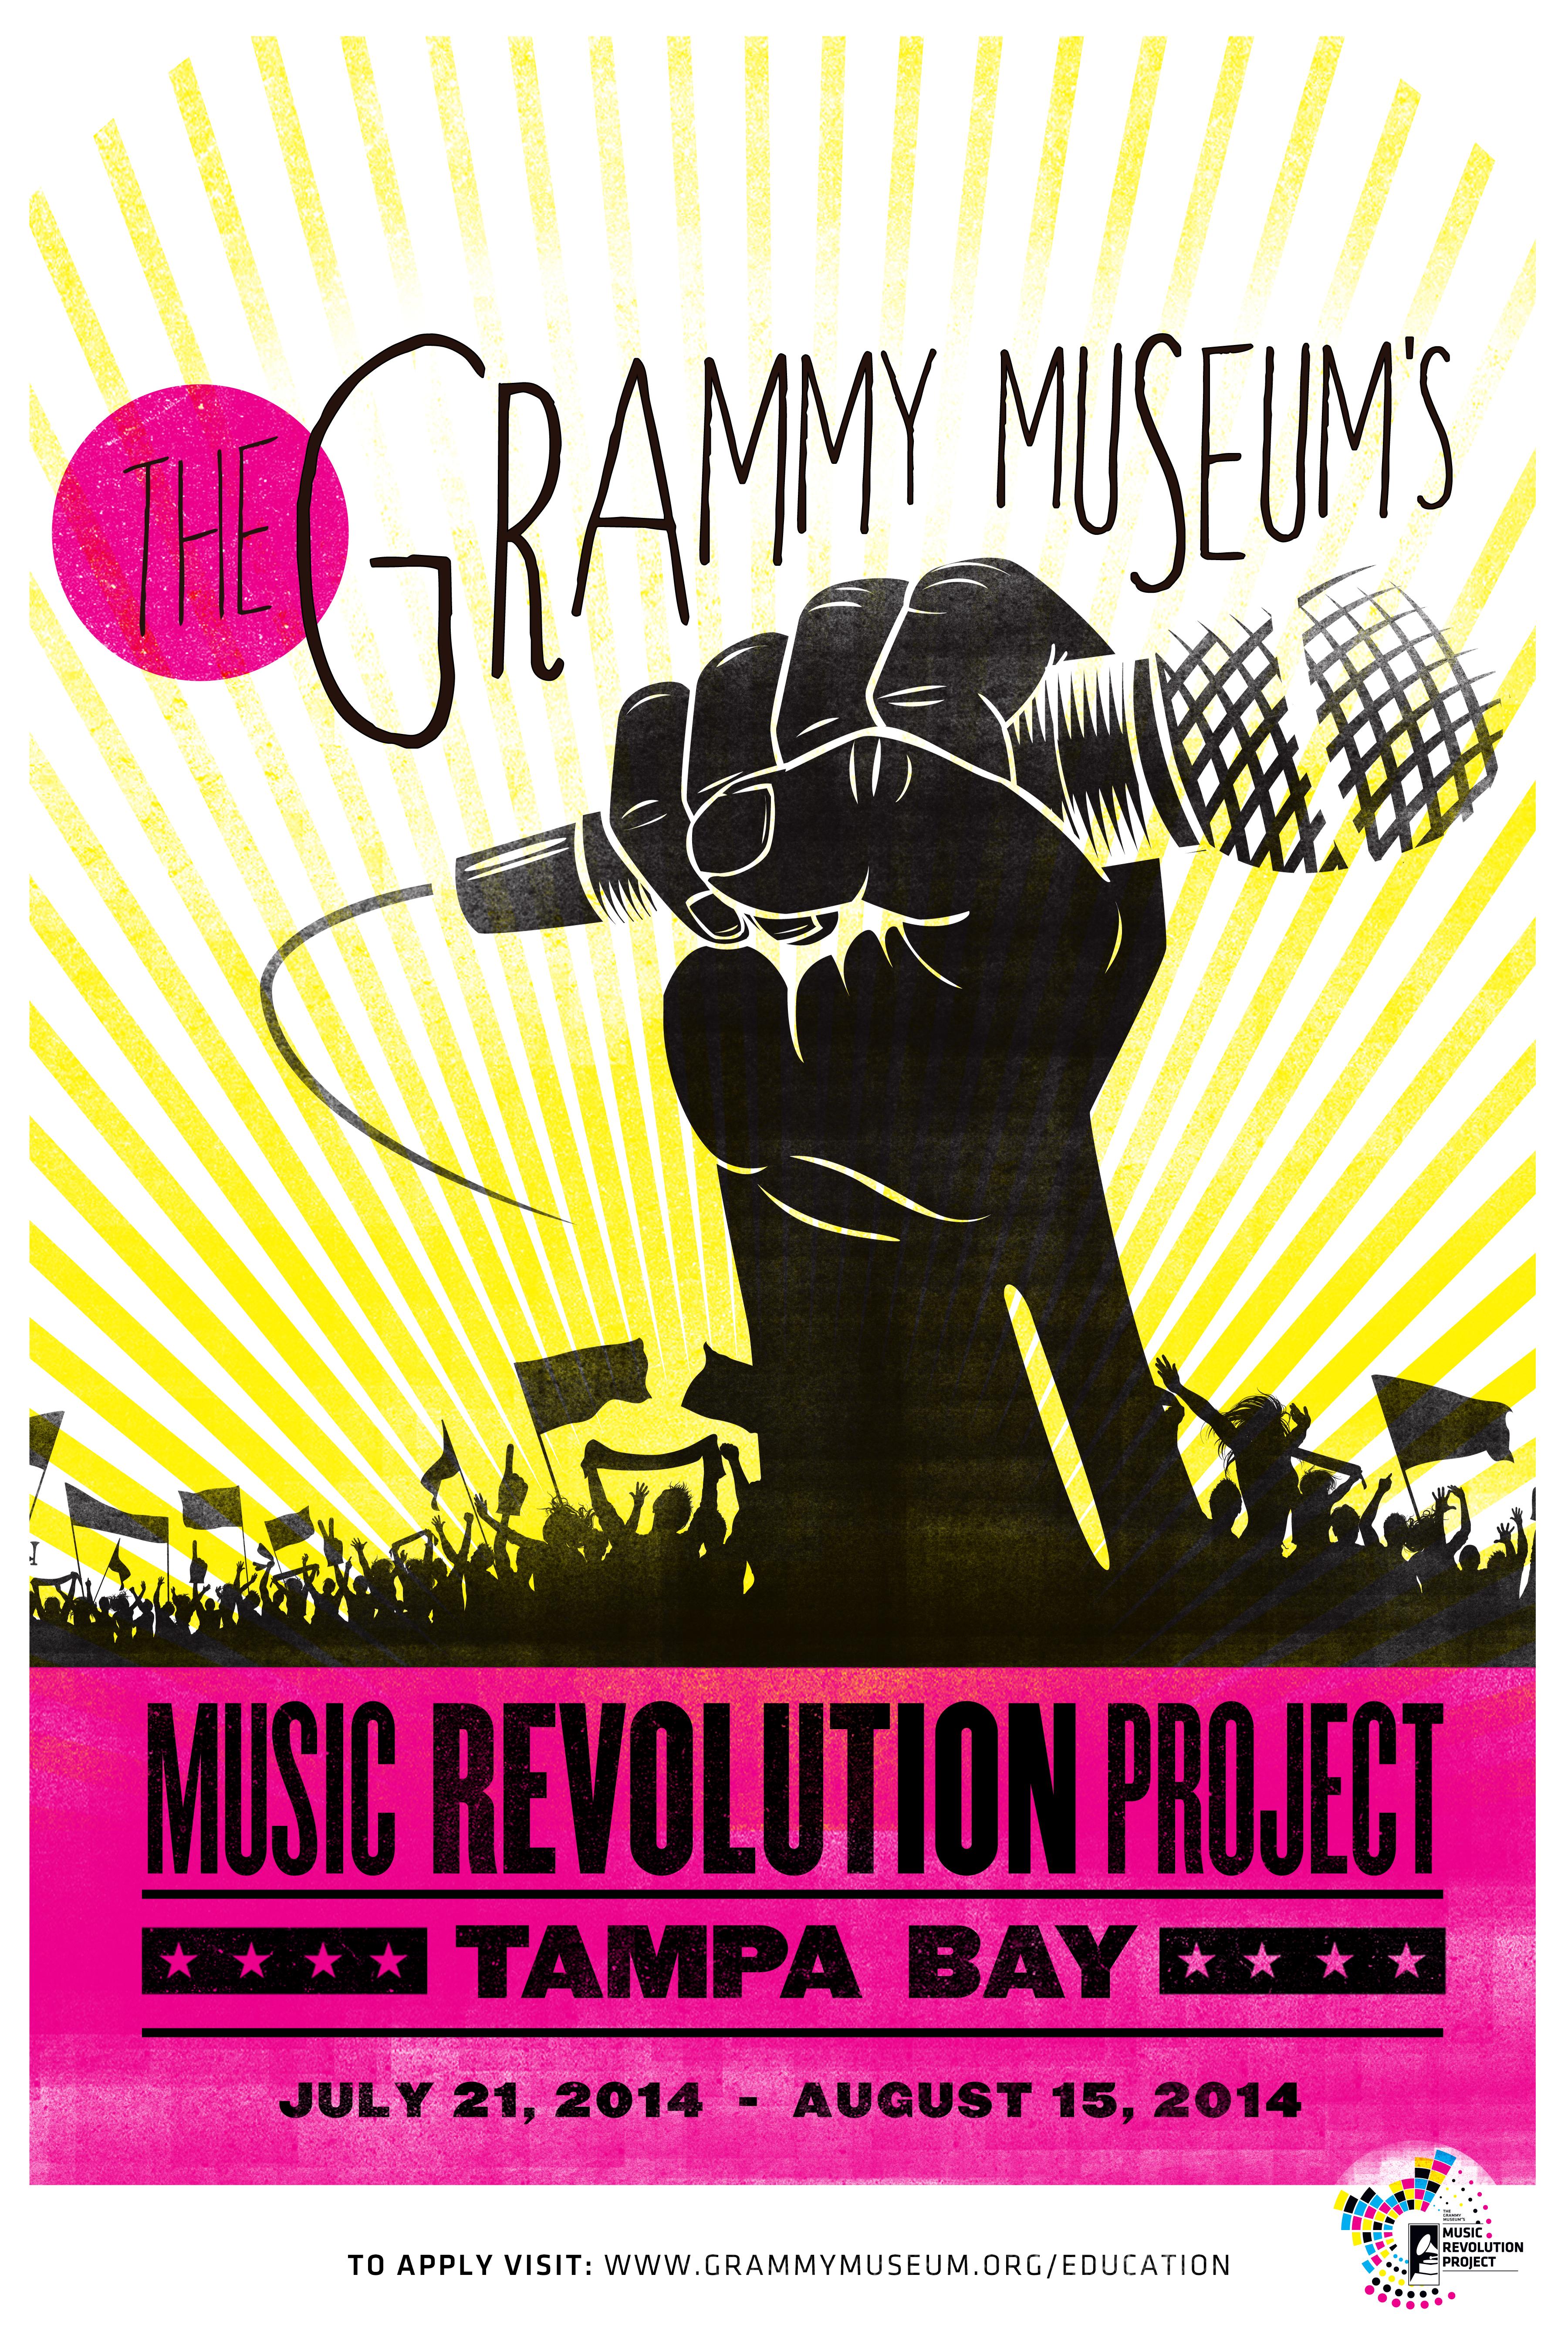 MusicRevolution_Tampa_2014.jpg